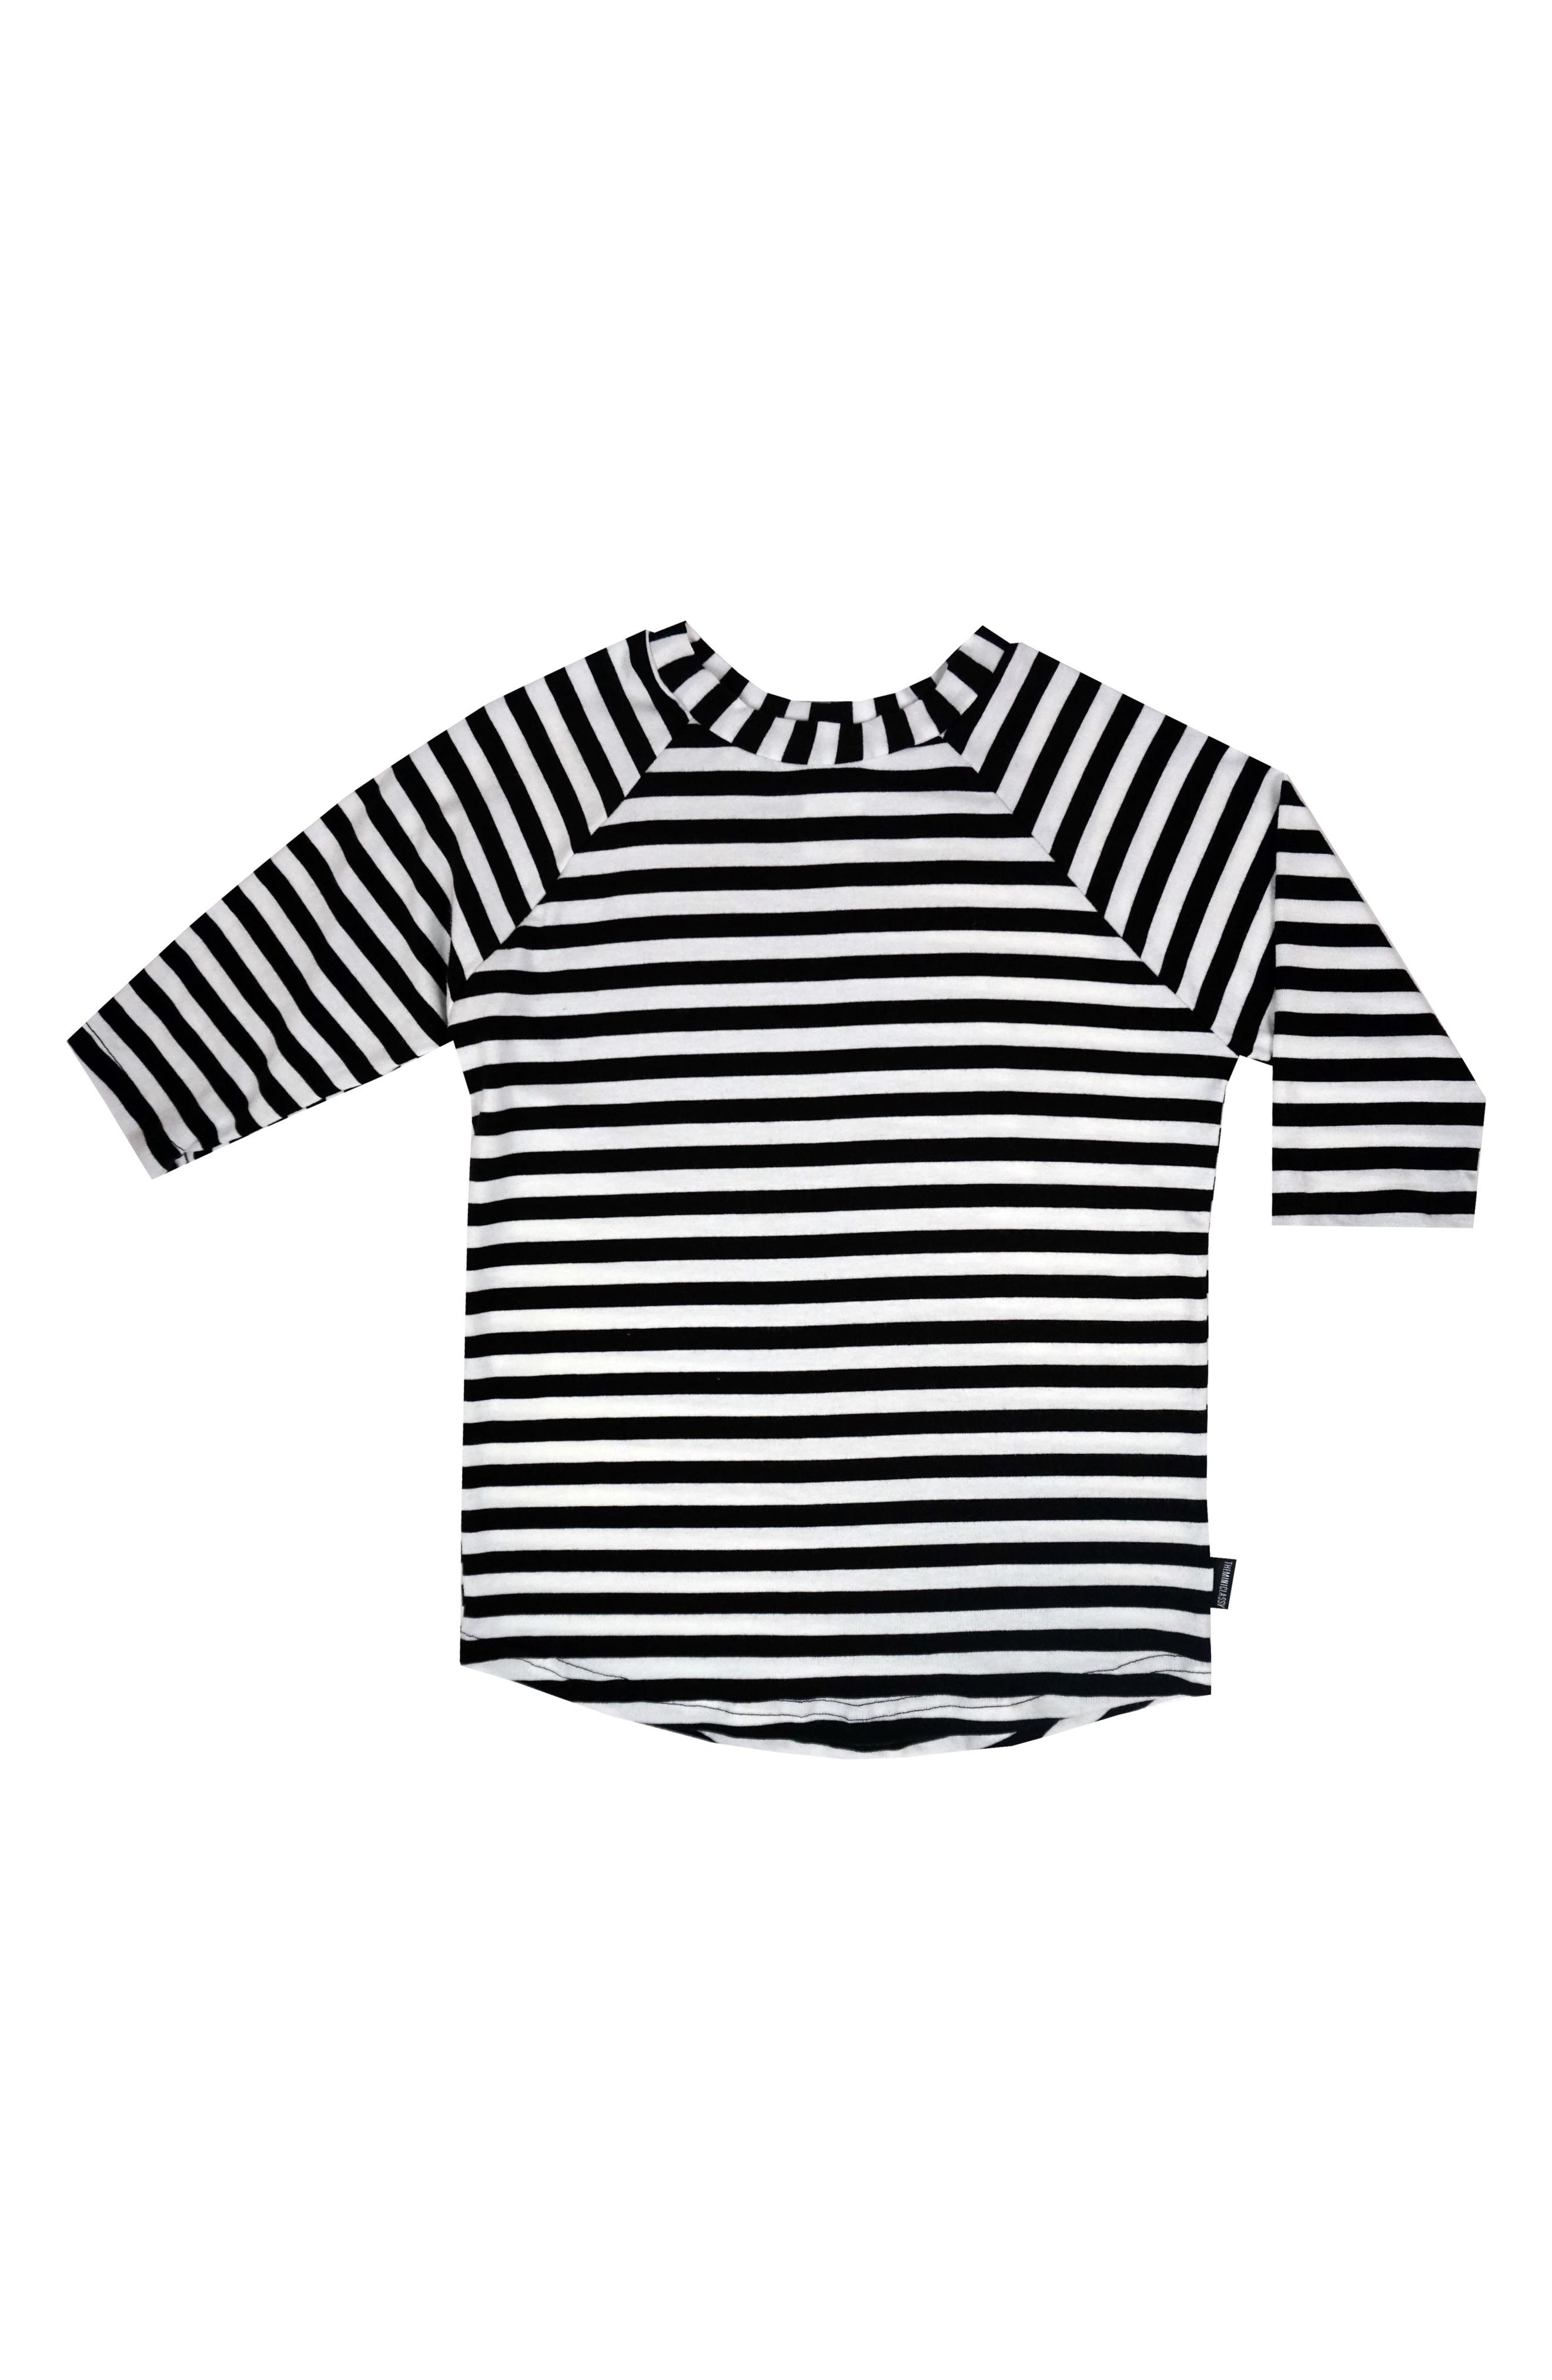 Main Image - THEMINICLASSY Raglan Sleeve T-Shirt (Toddler Boys & Little Boys)